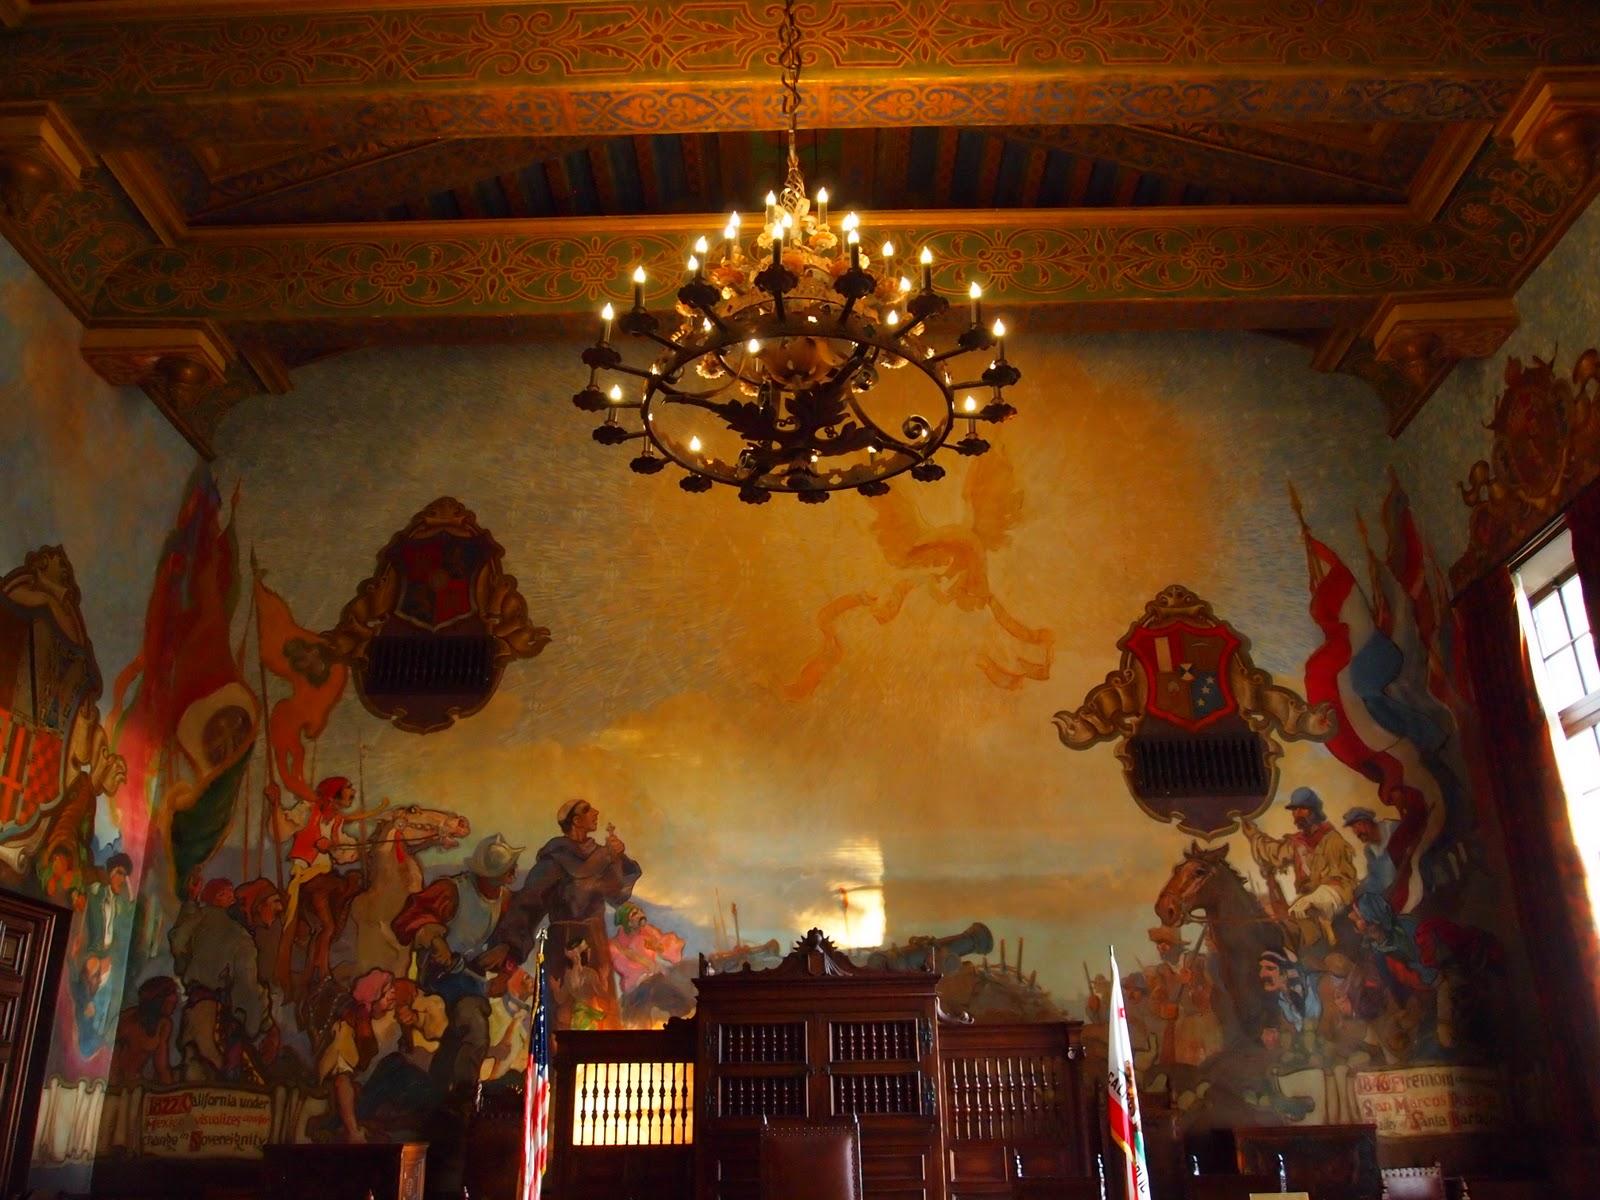 Aim high willis aim high santa barbara county courthouse for Mural room santa barbara courthouse